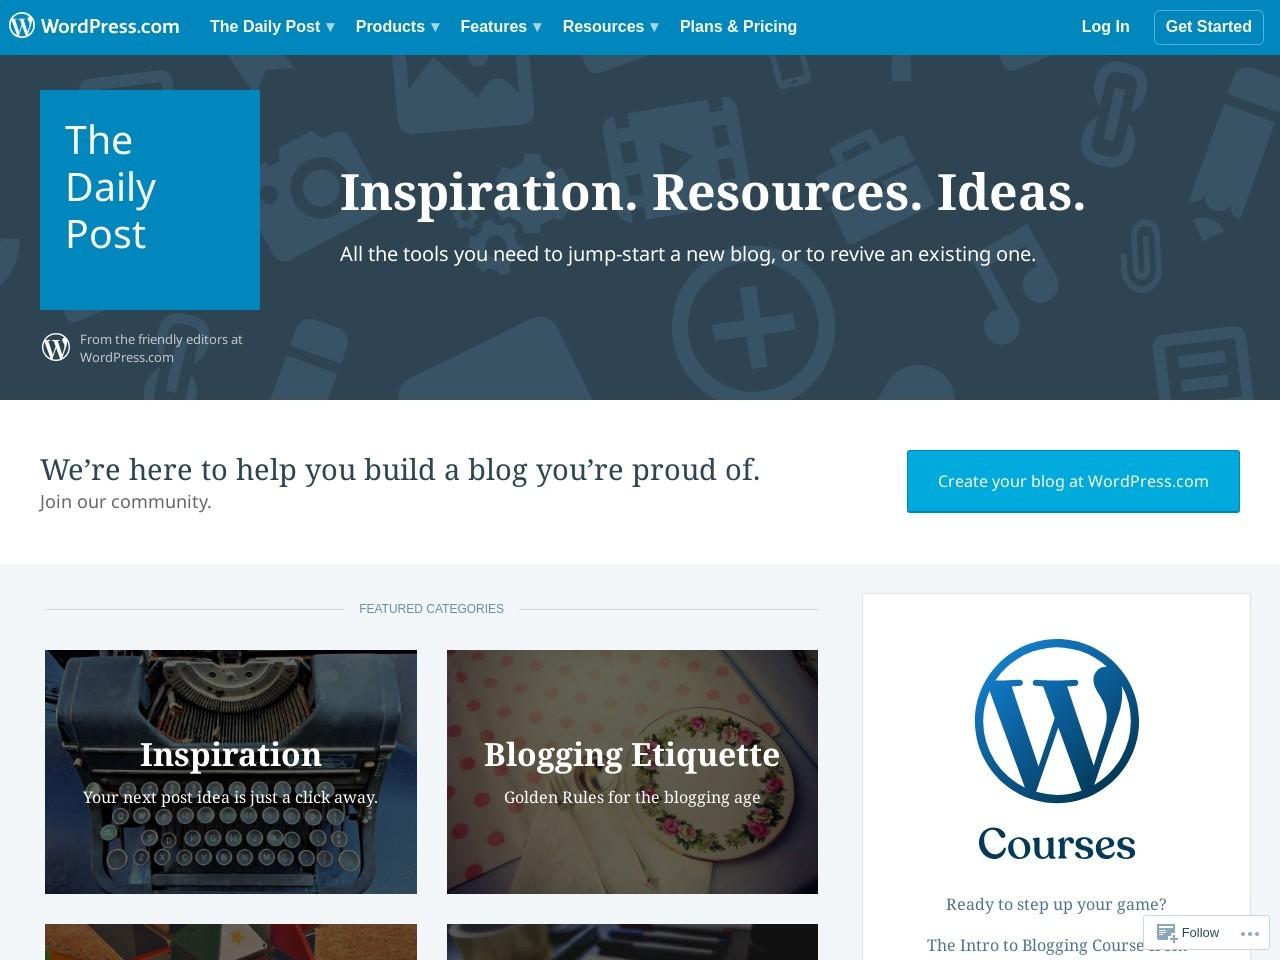 New to WordPress? Blogging 101 starts on January 5. | The …